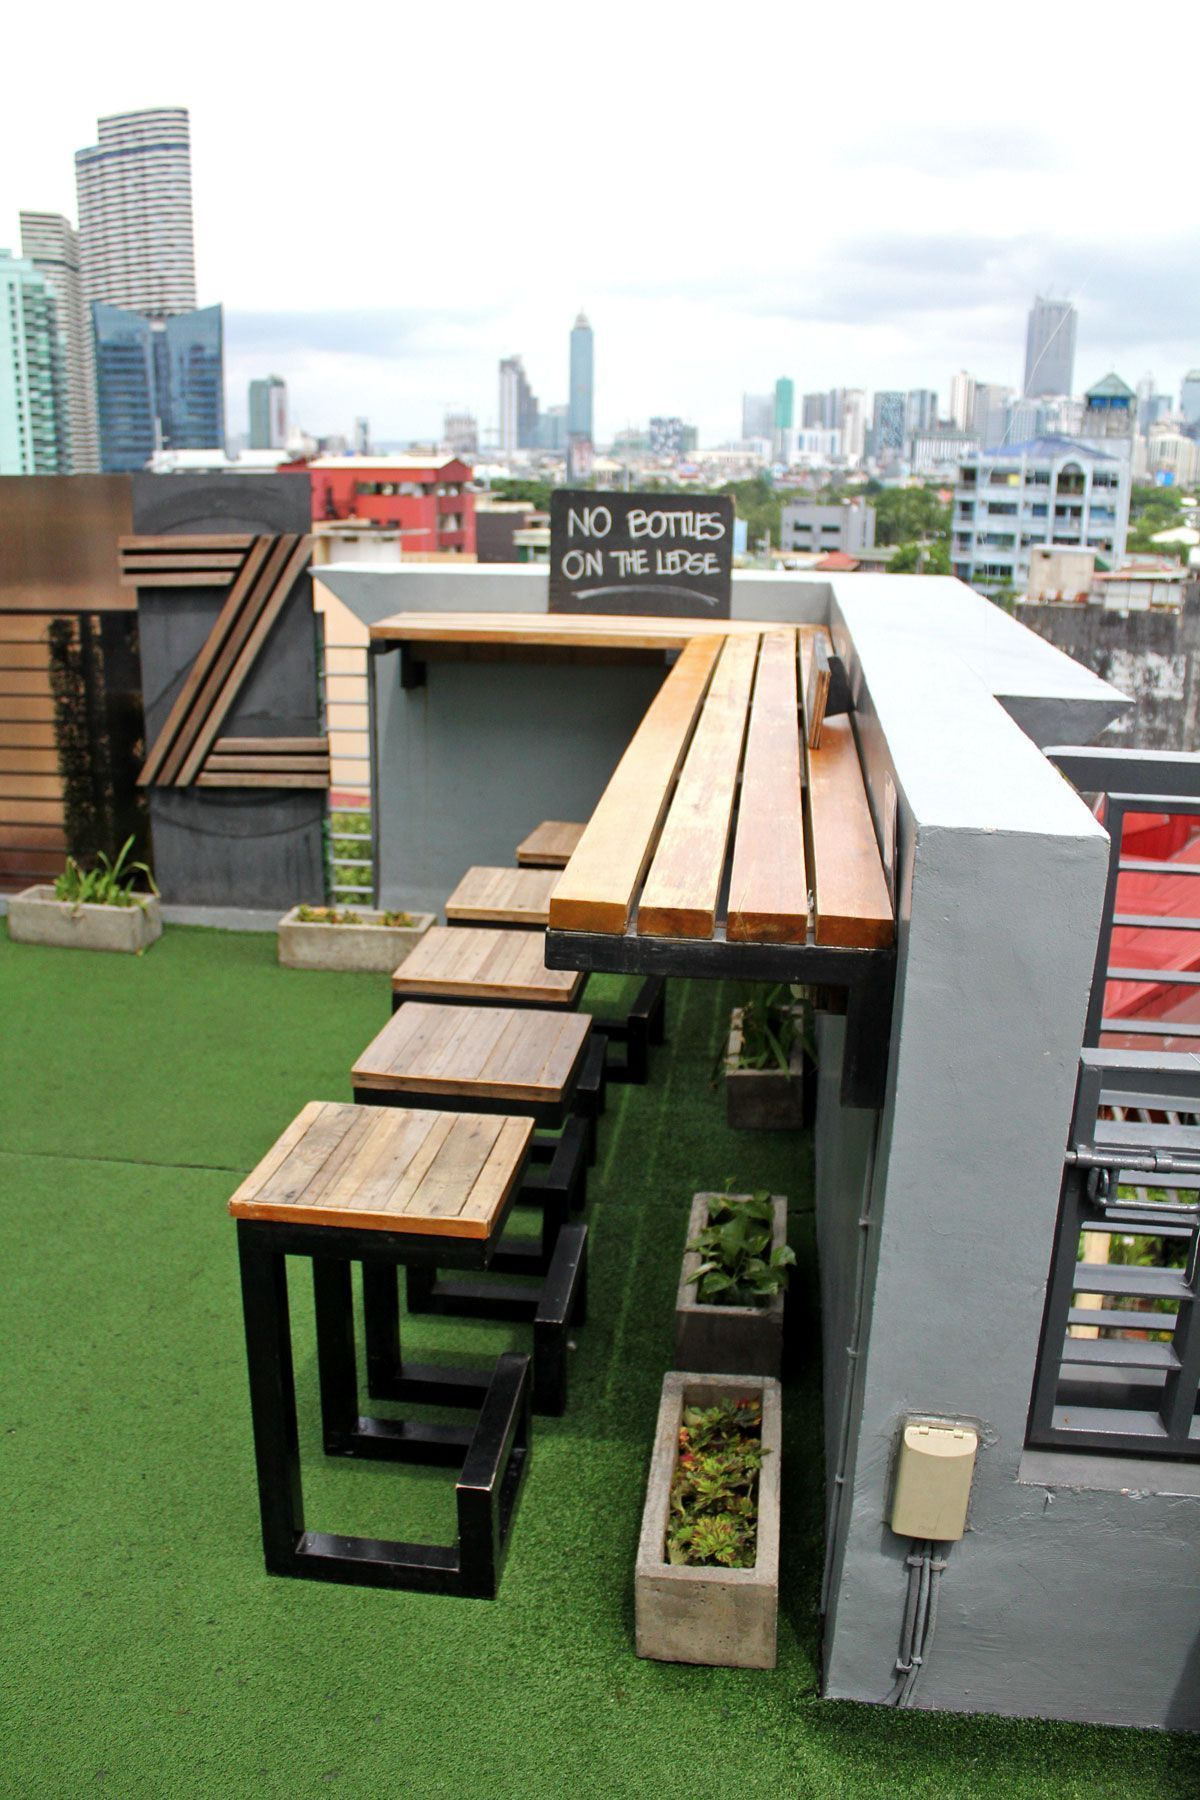 31 Amazing Ideas Rooftop Design Patio New York City Pojocraft Rooftop Design Rooftop Patio Patio Design